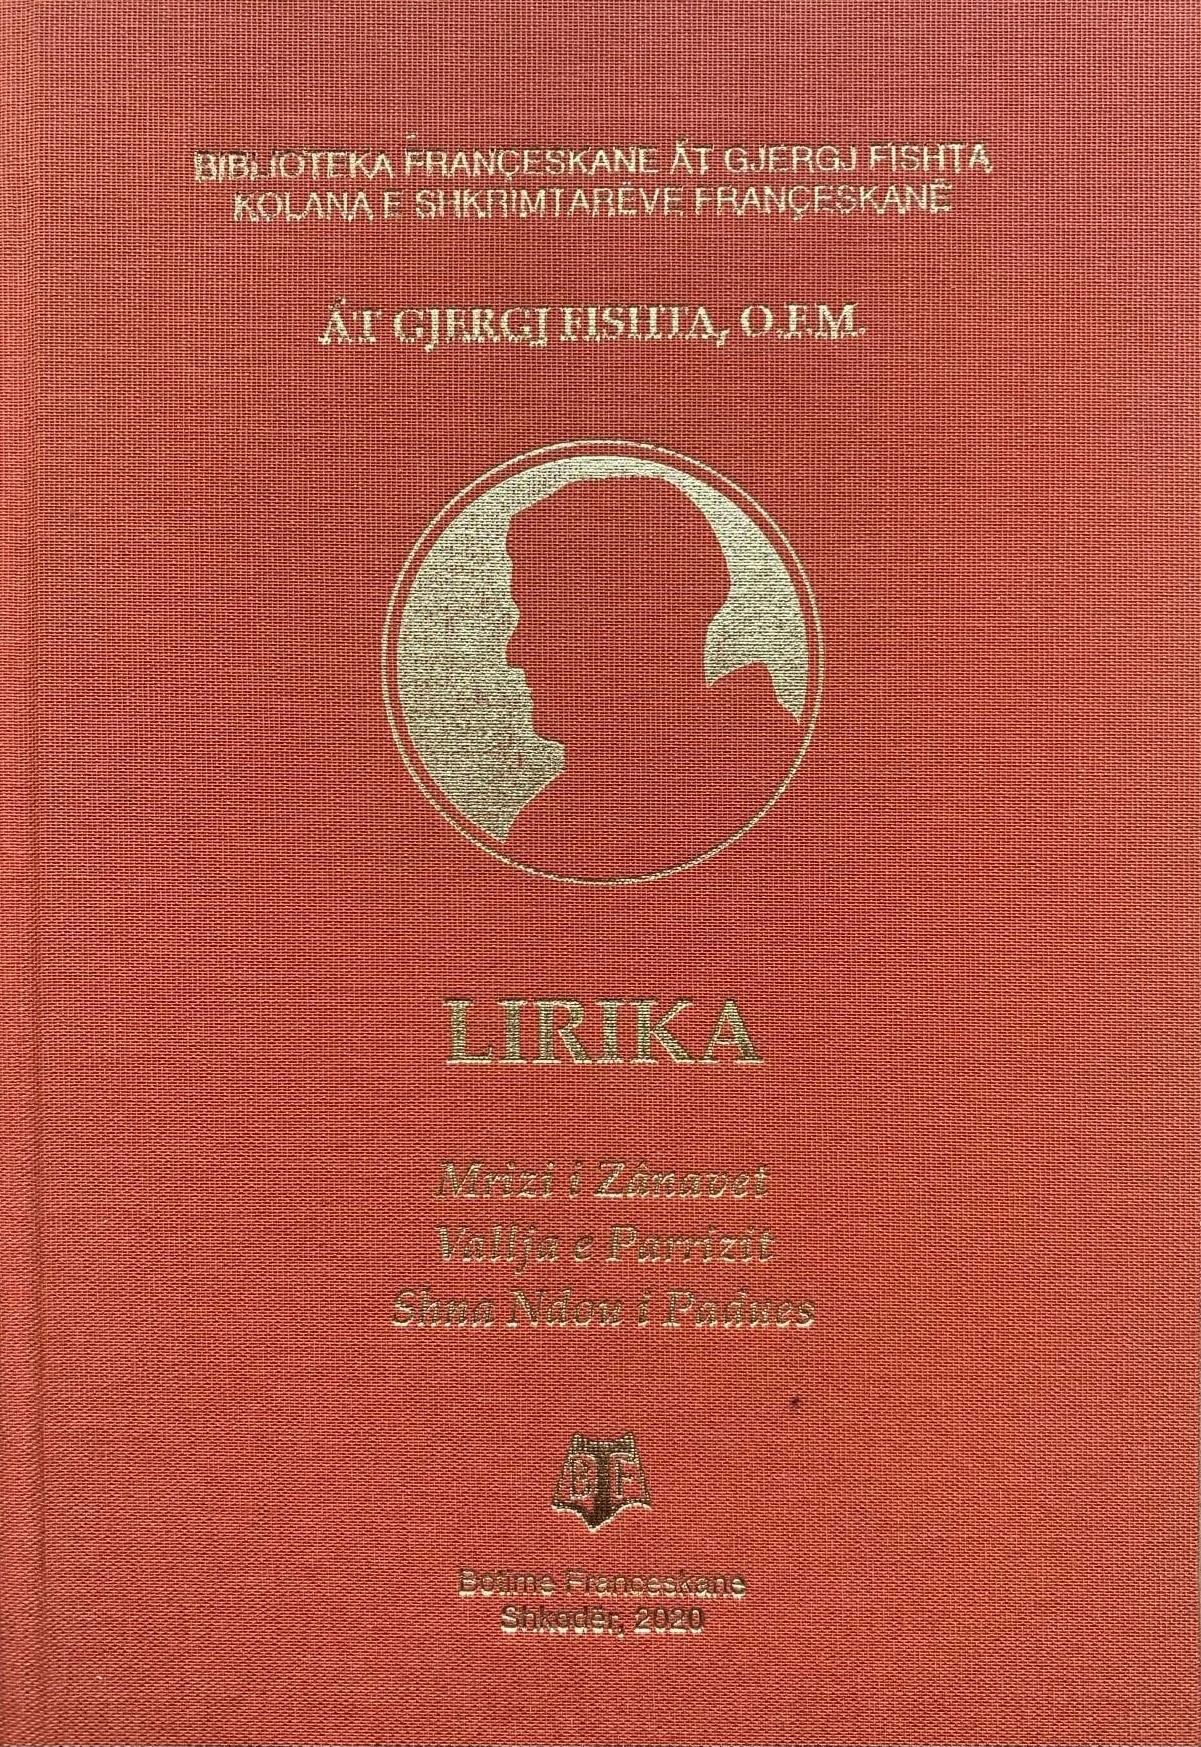 Lirika – Gjergj Fishta